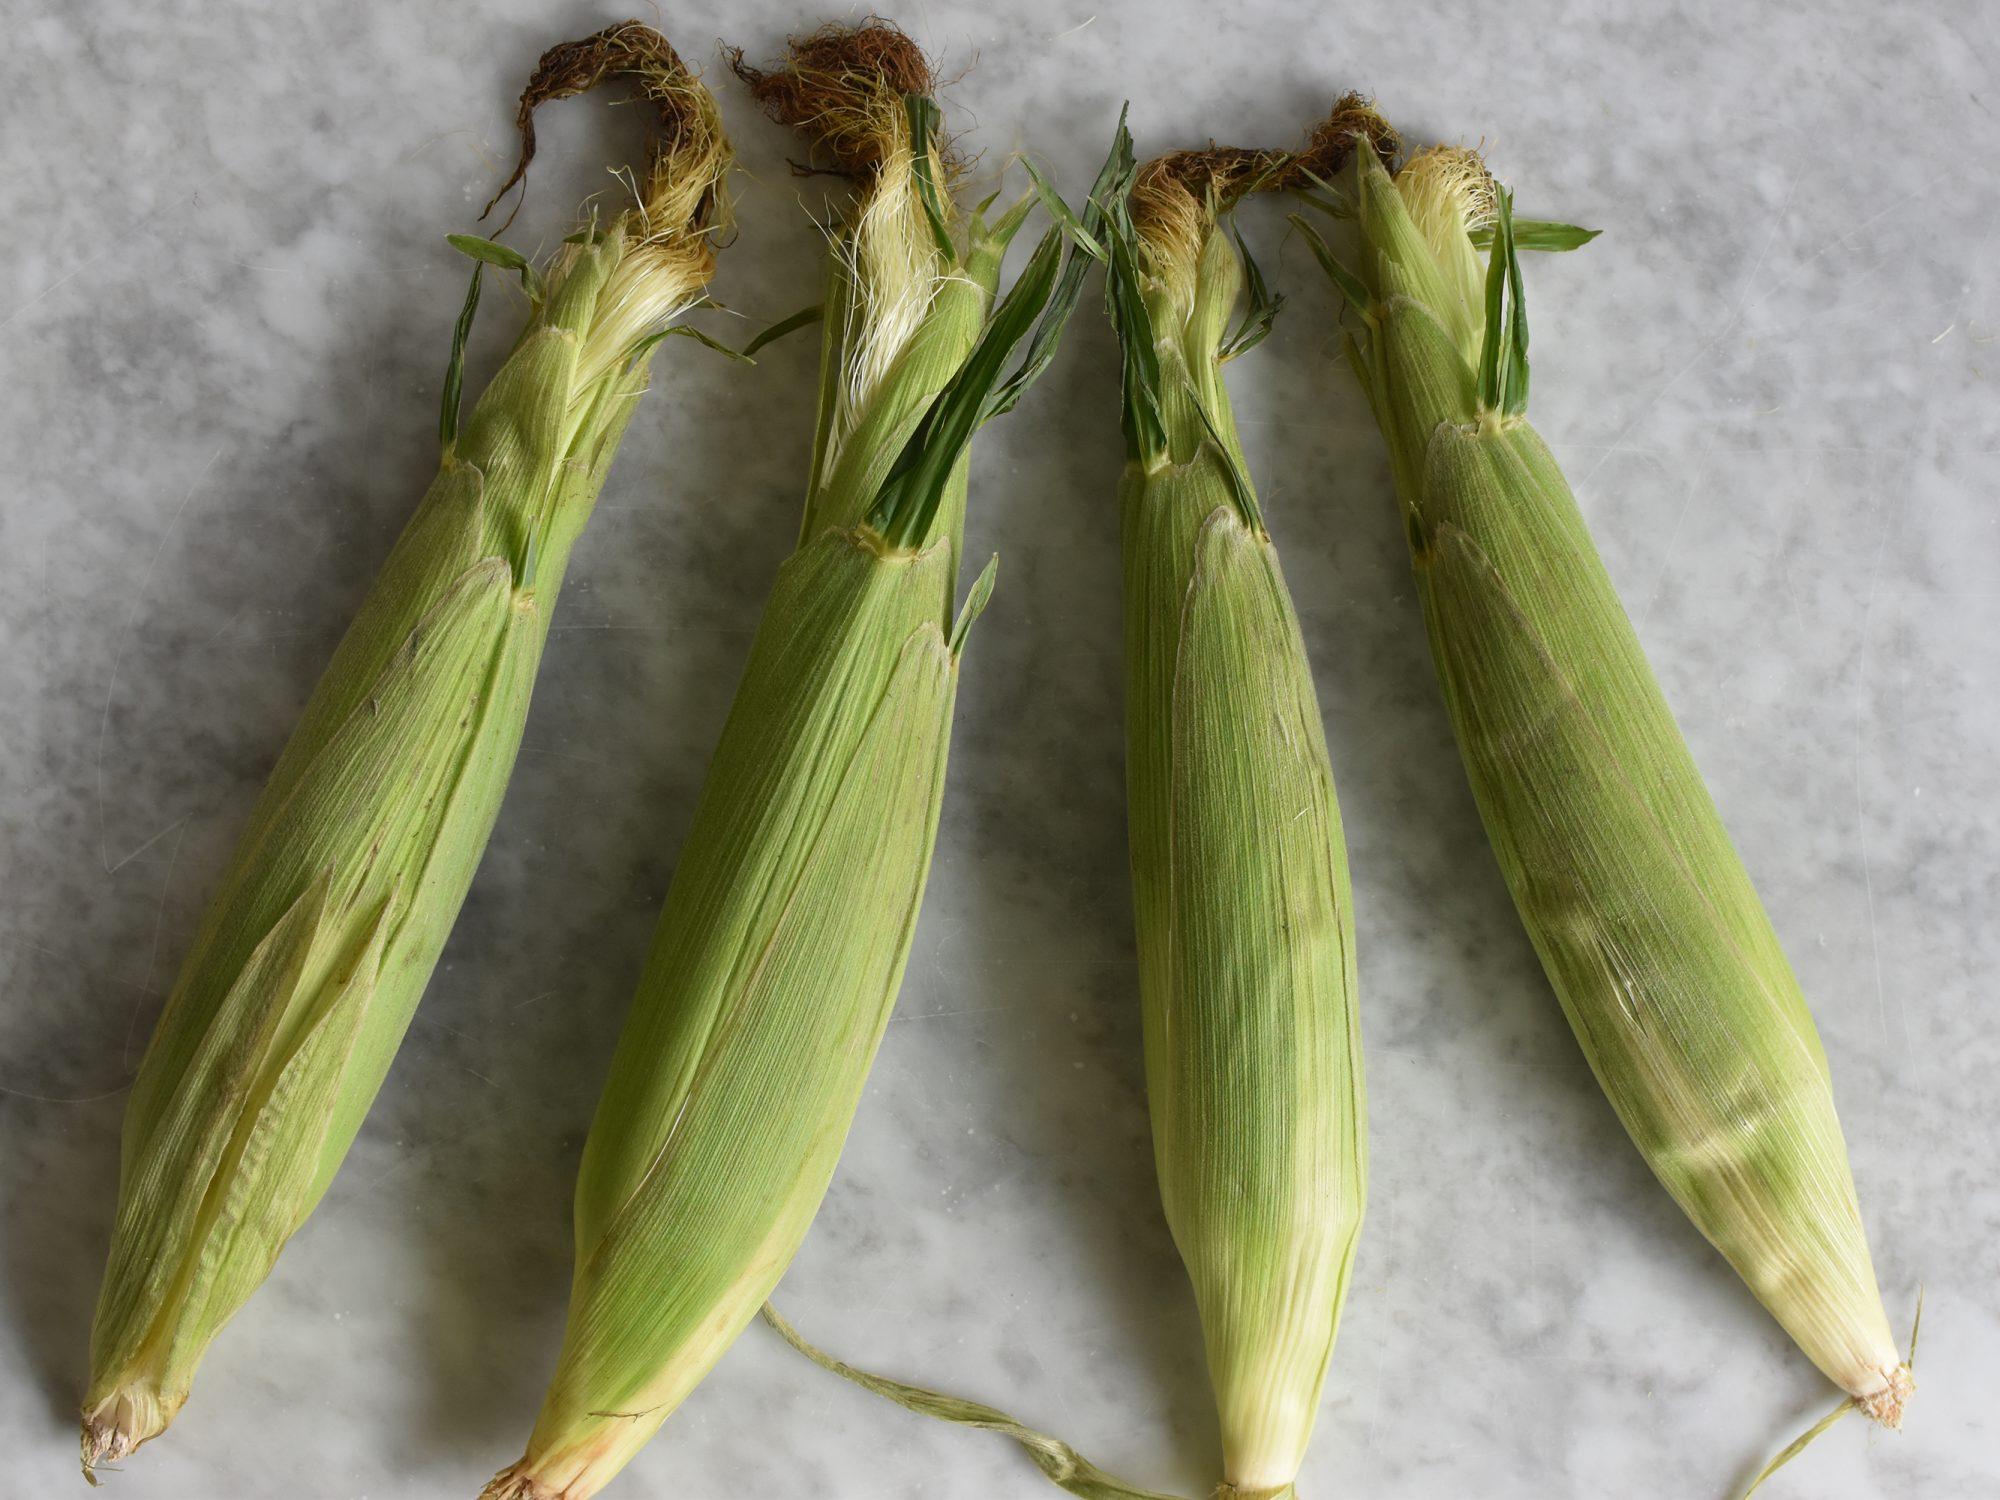 how-to-freeze-corn-on-the-cob-1.jpg